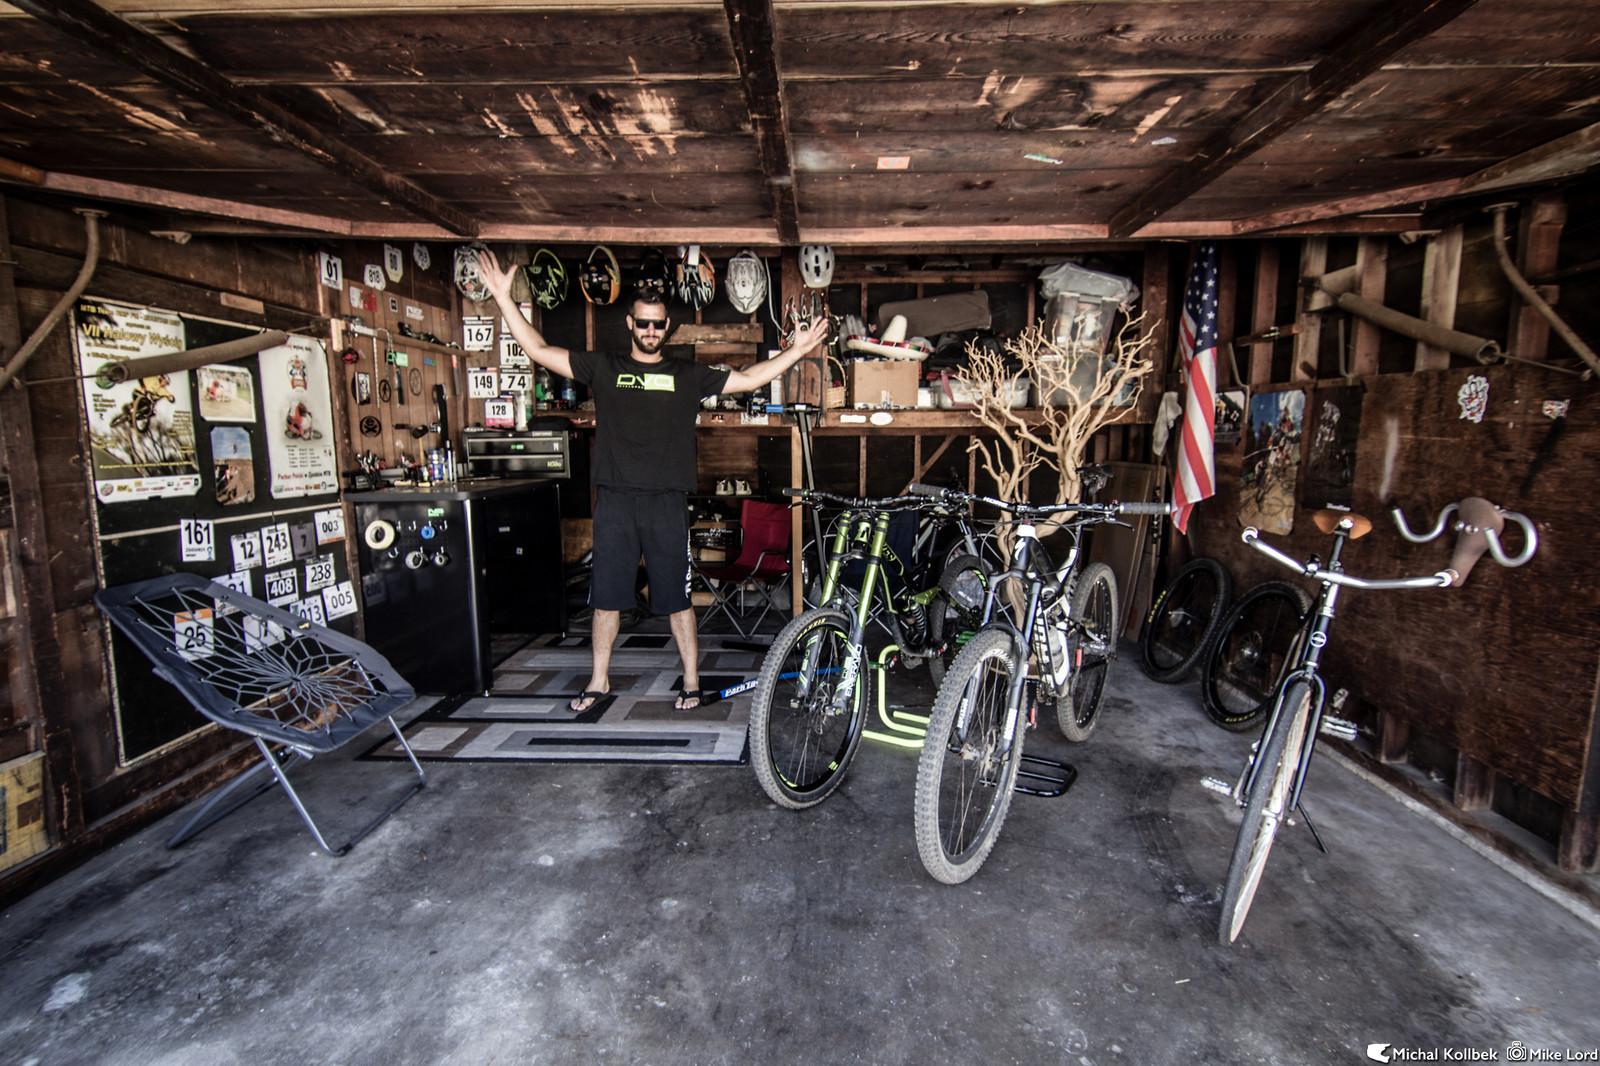 Jacks Man Cave Store : Michal kollbek man cave mikelord mountain biking